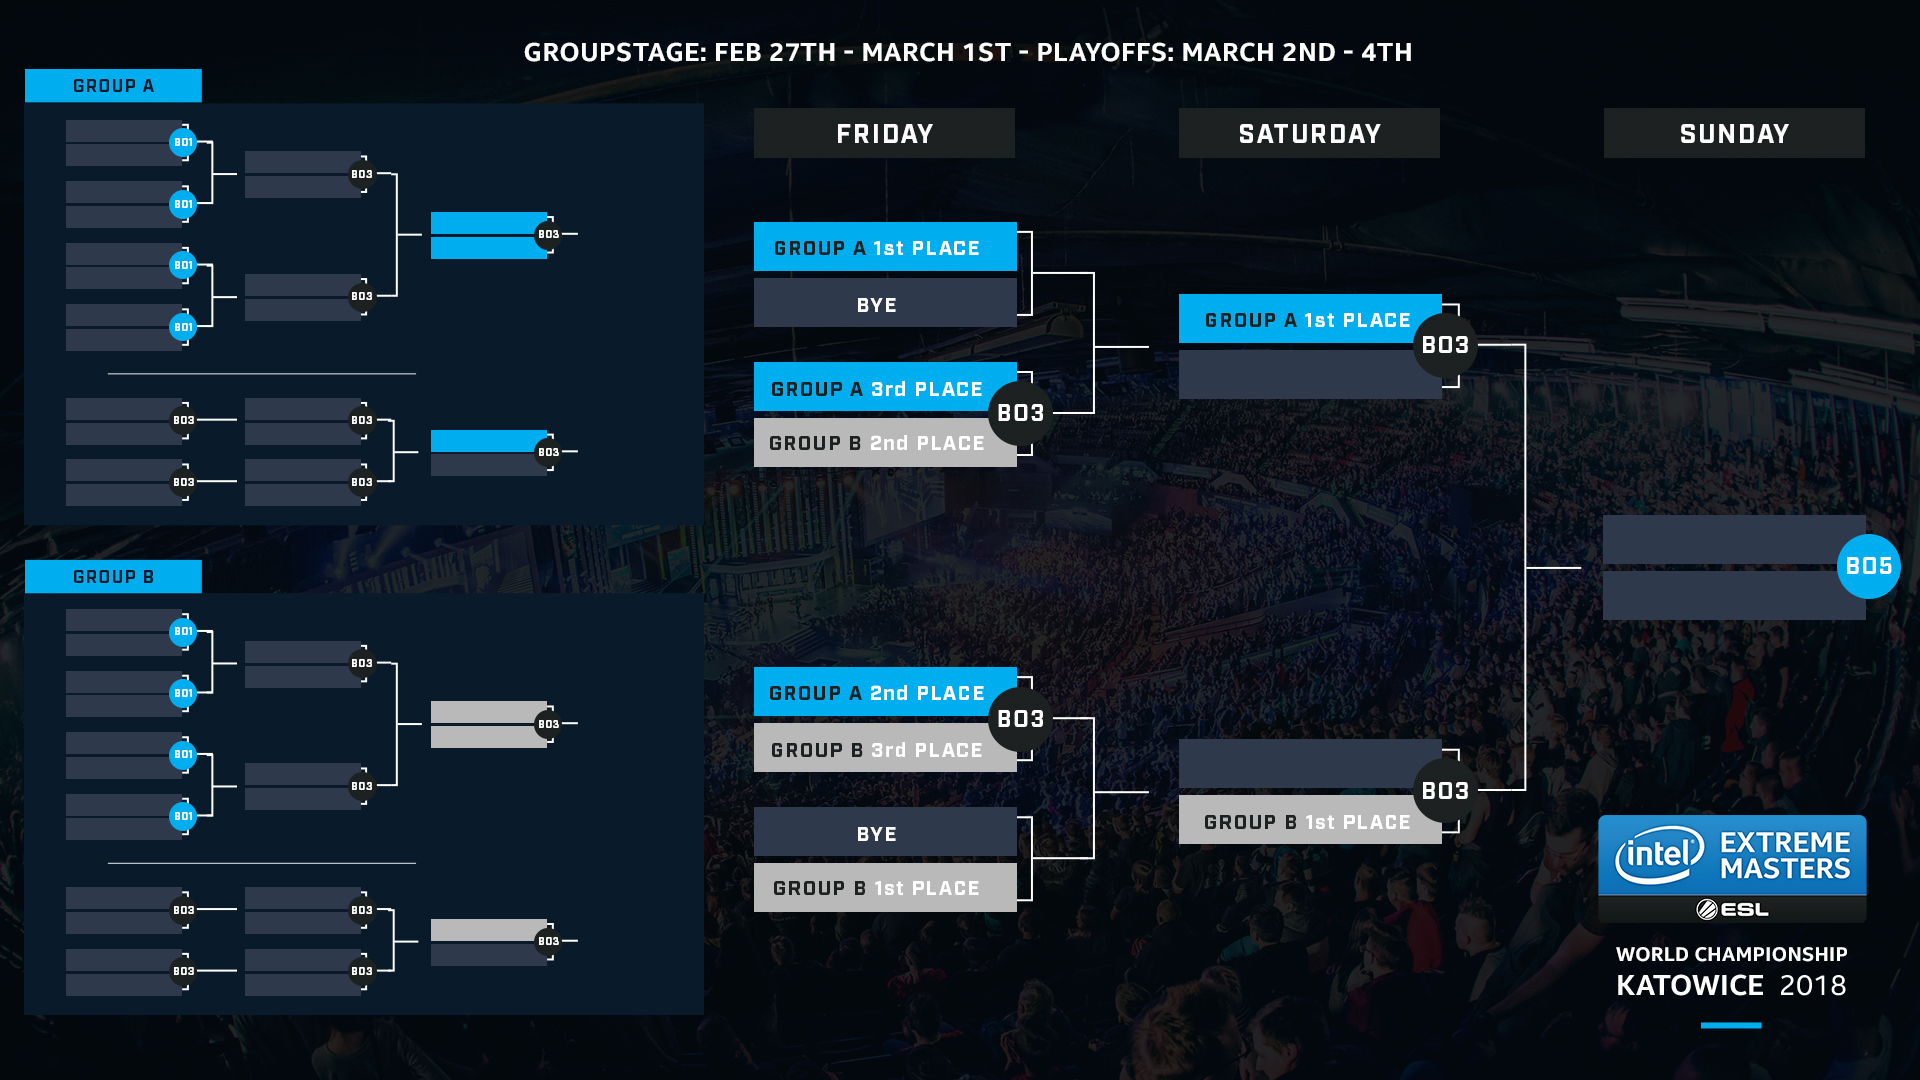 IEMKatowice18_TournamentFormat18_1920x1080_Final_Stage